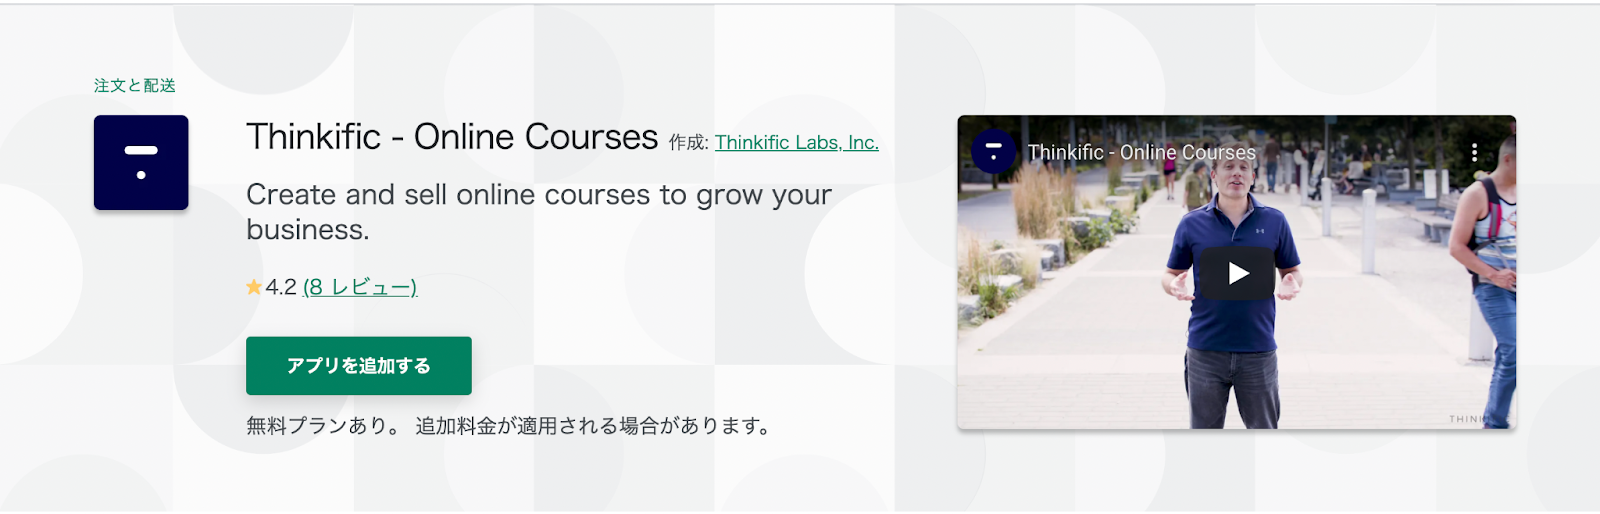 shopify デジタルコンテンツ アプリ Thinkific